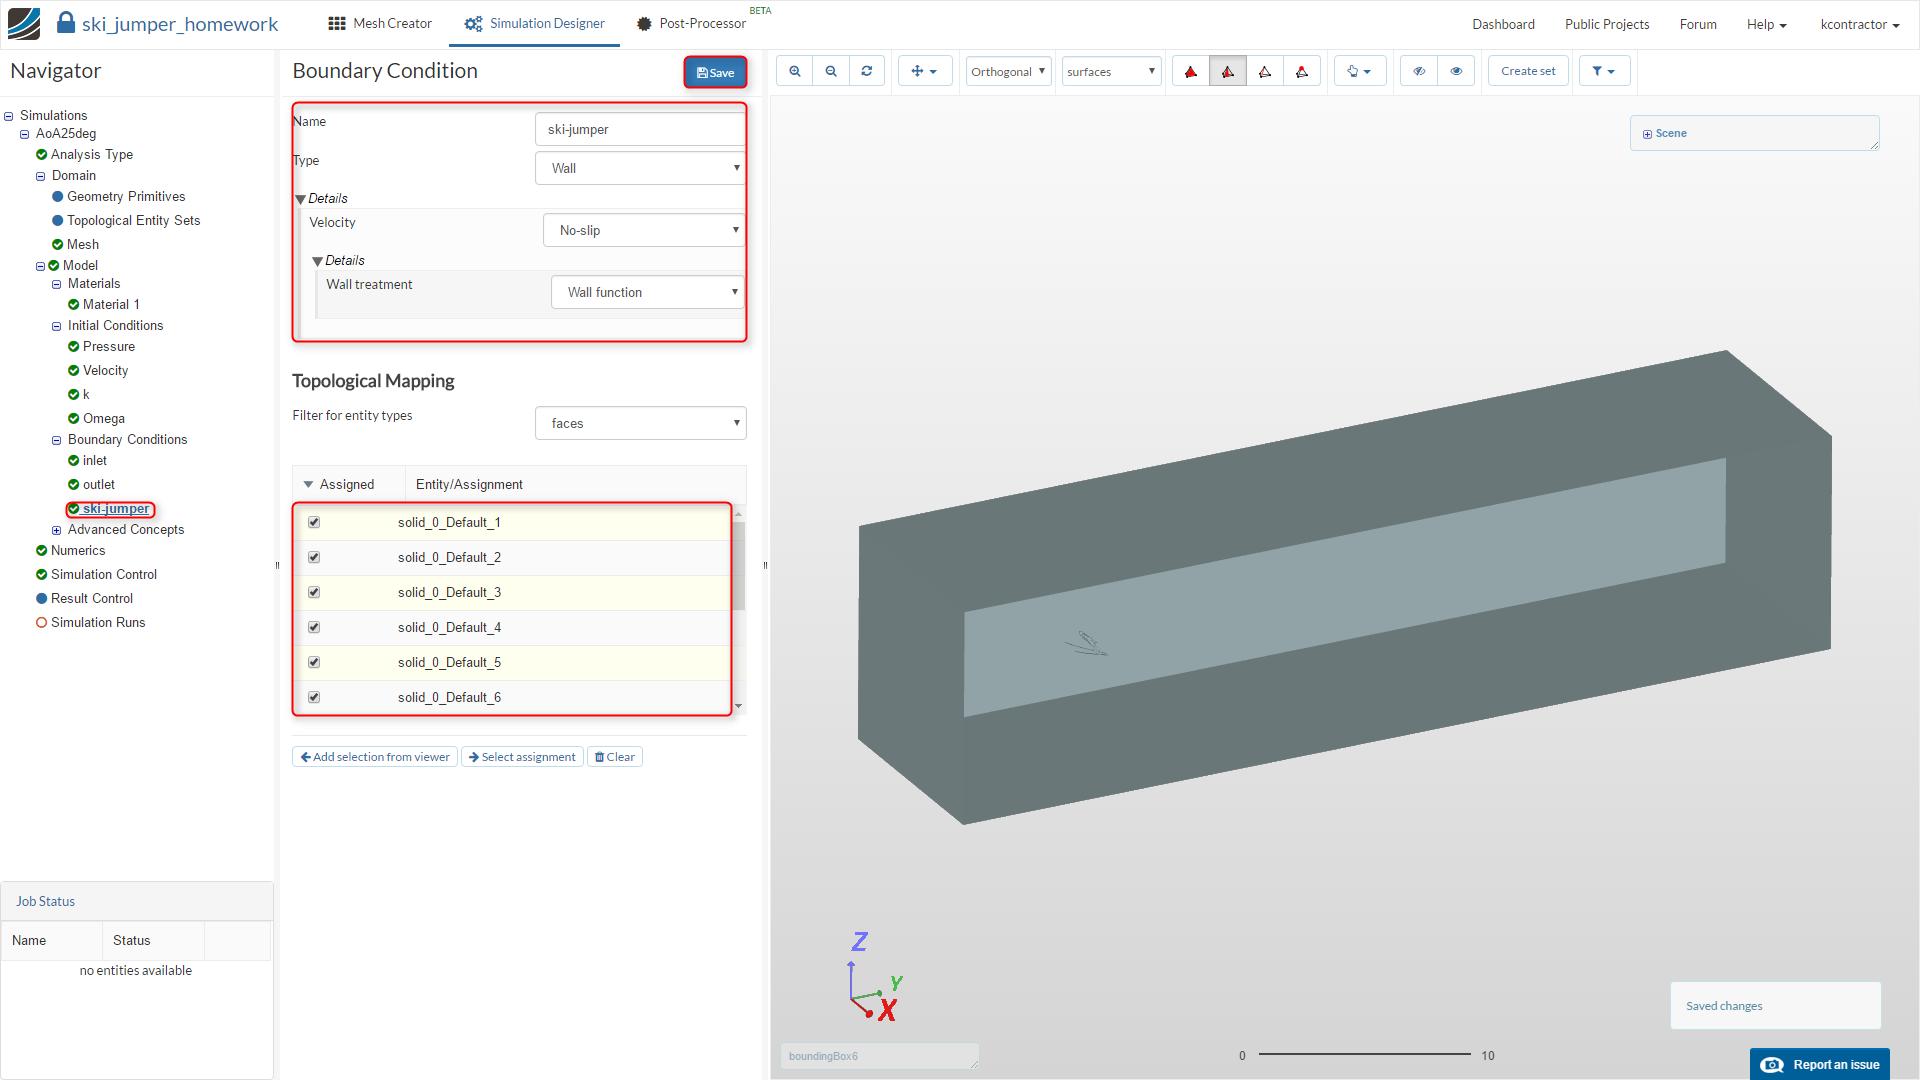 sports aerodynamics workshop homework step-by-step tutorial, new boundary condition